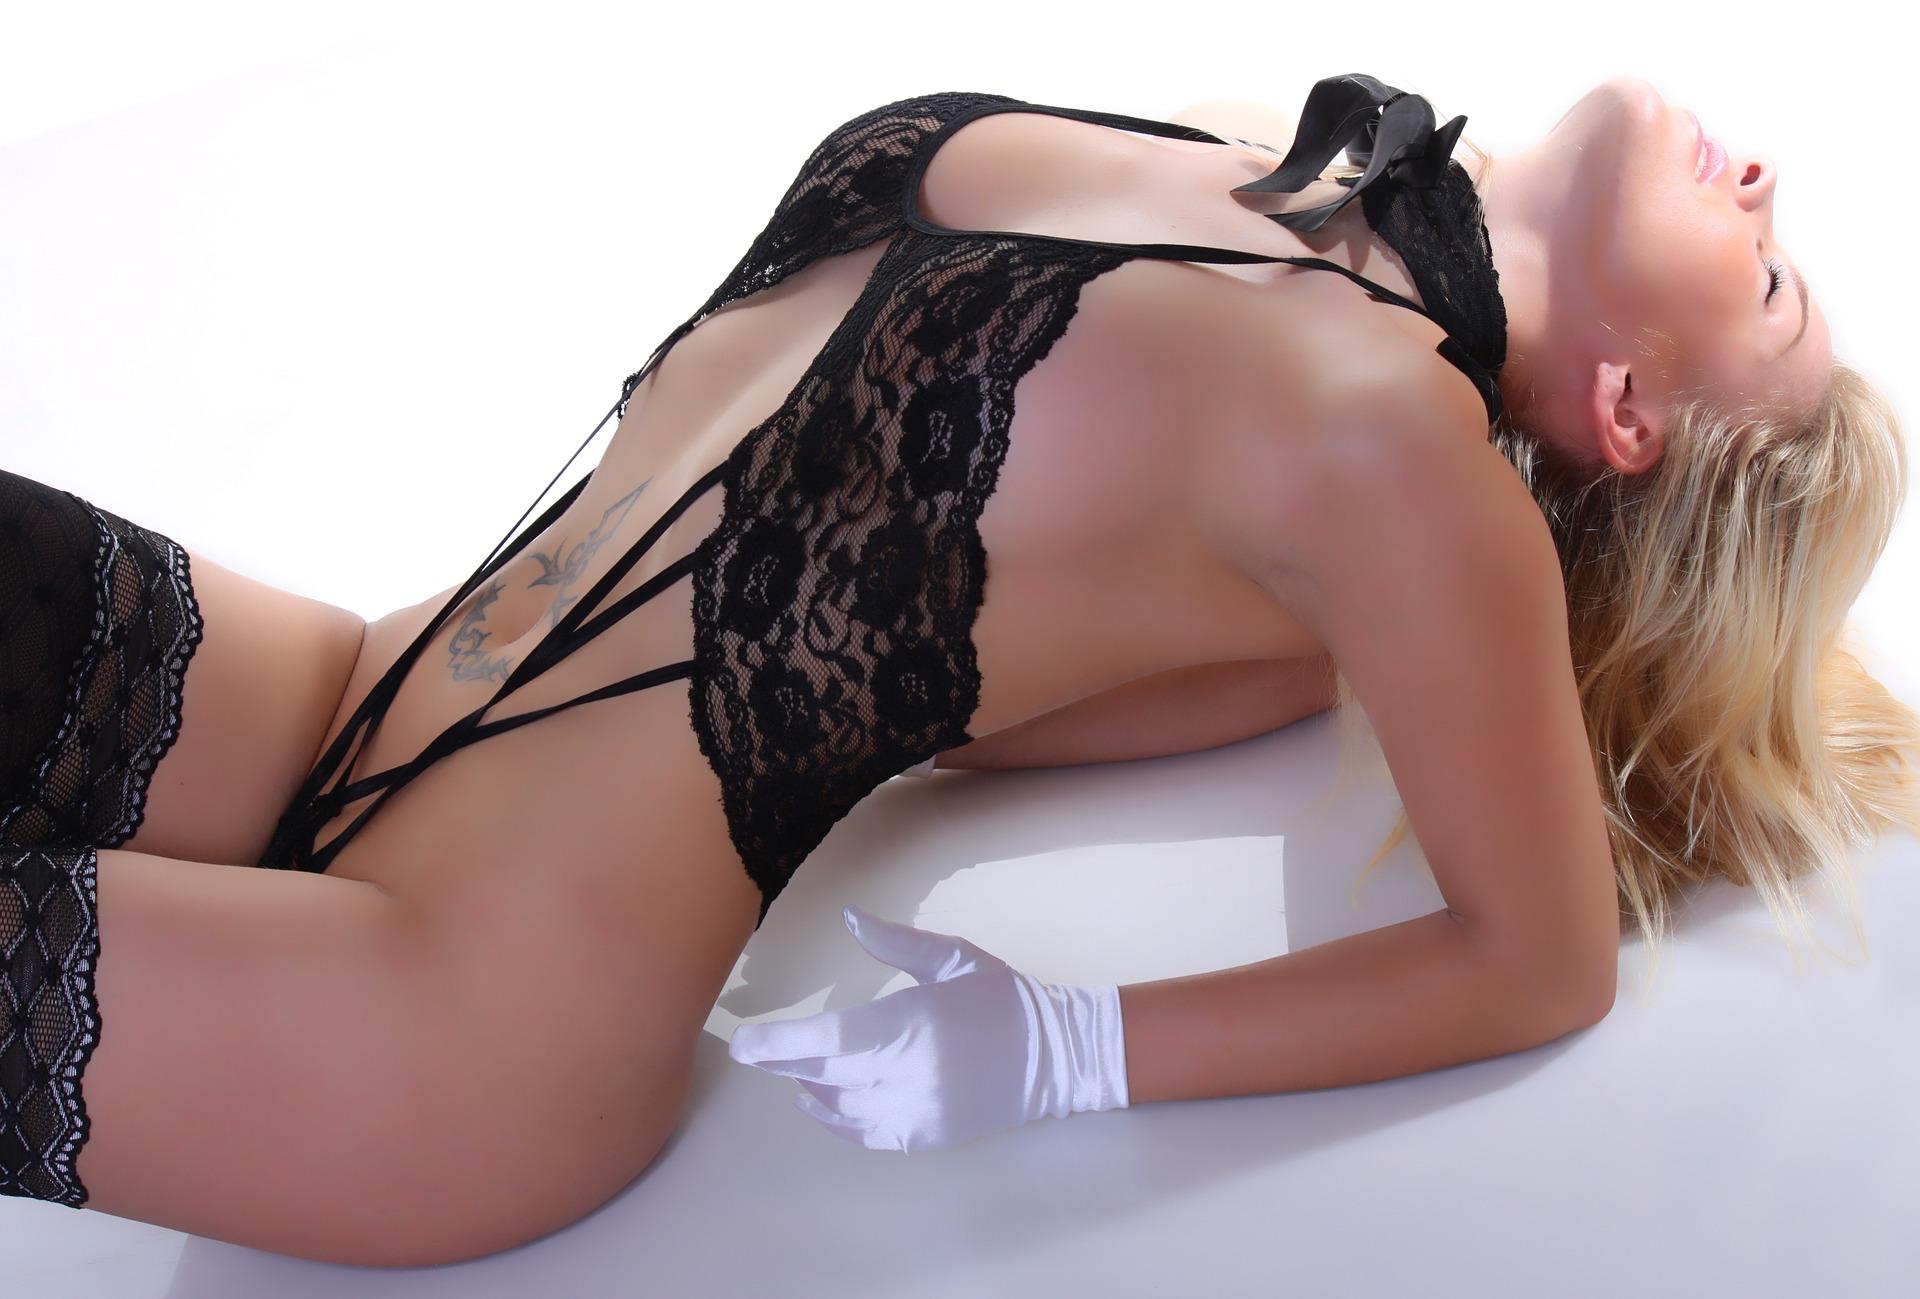 Unleash Your Inner Slut | Taara Rose | The Spiritual Slut | Lexi Sylver SDC Sex Podcast